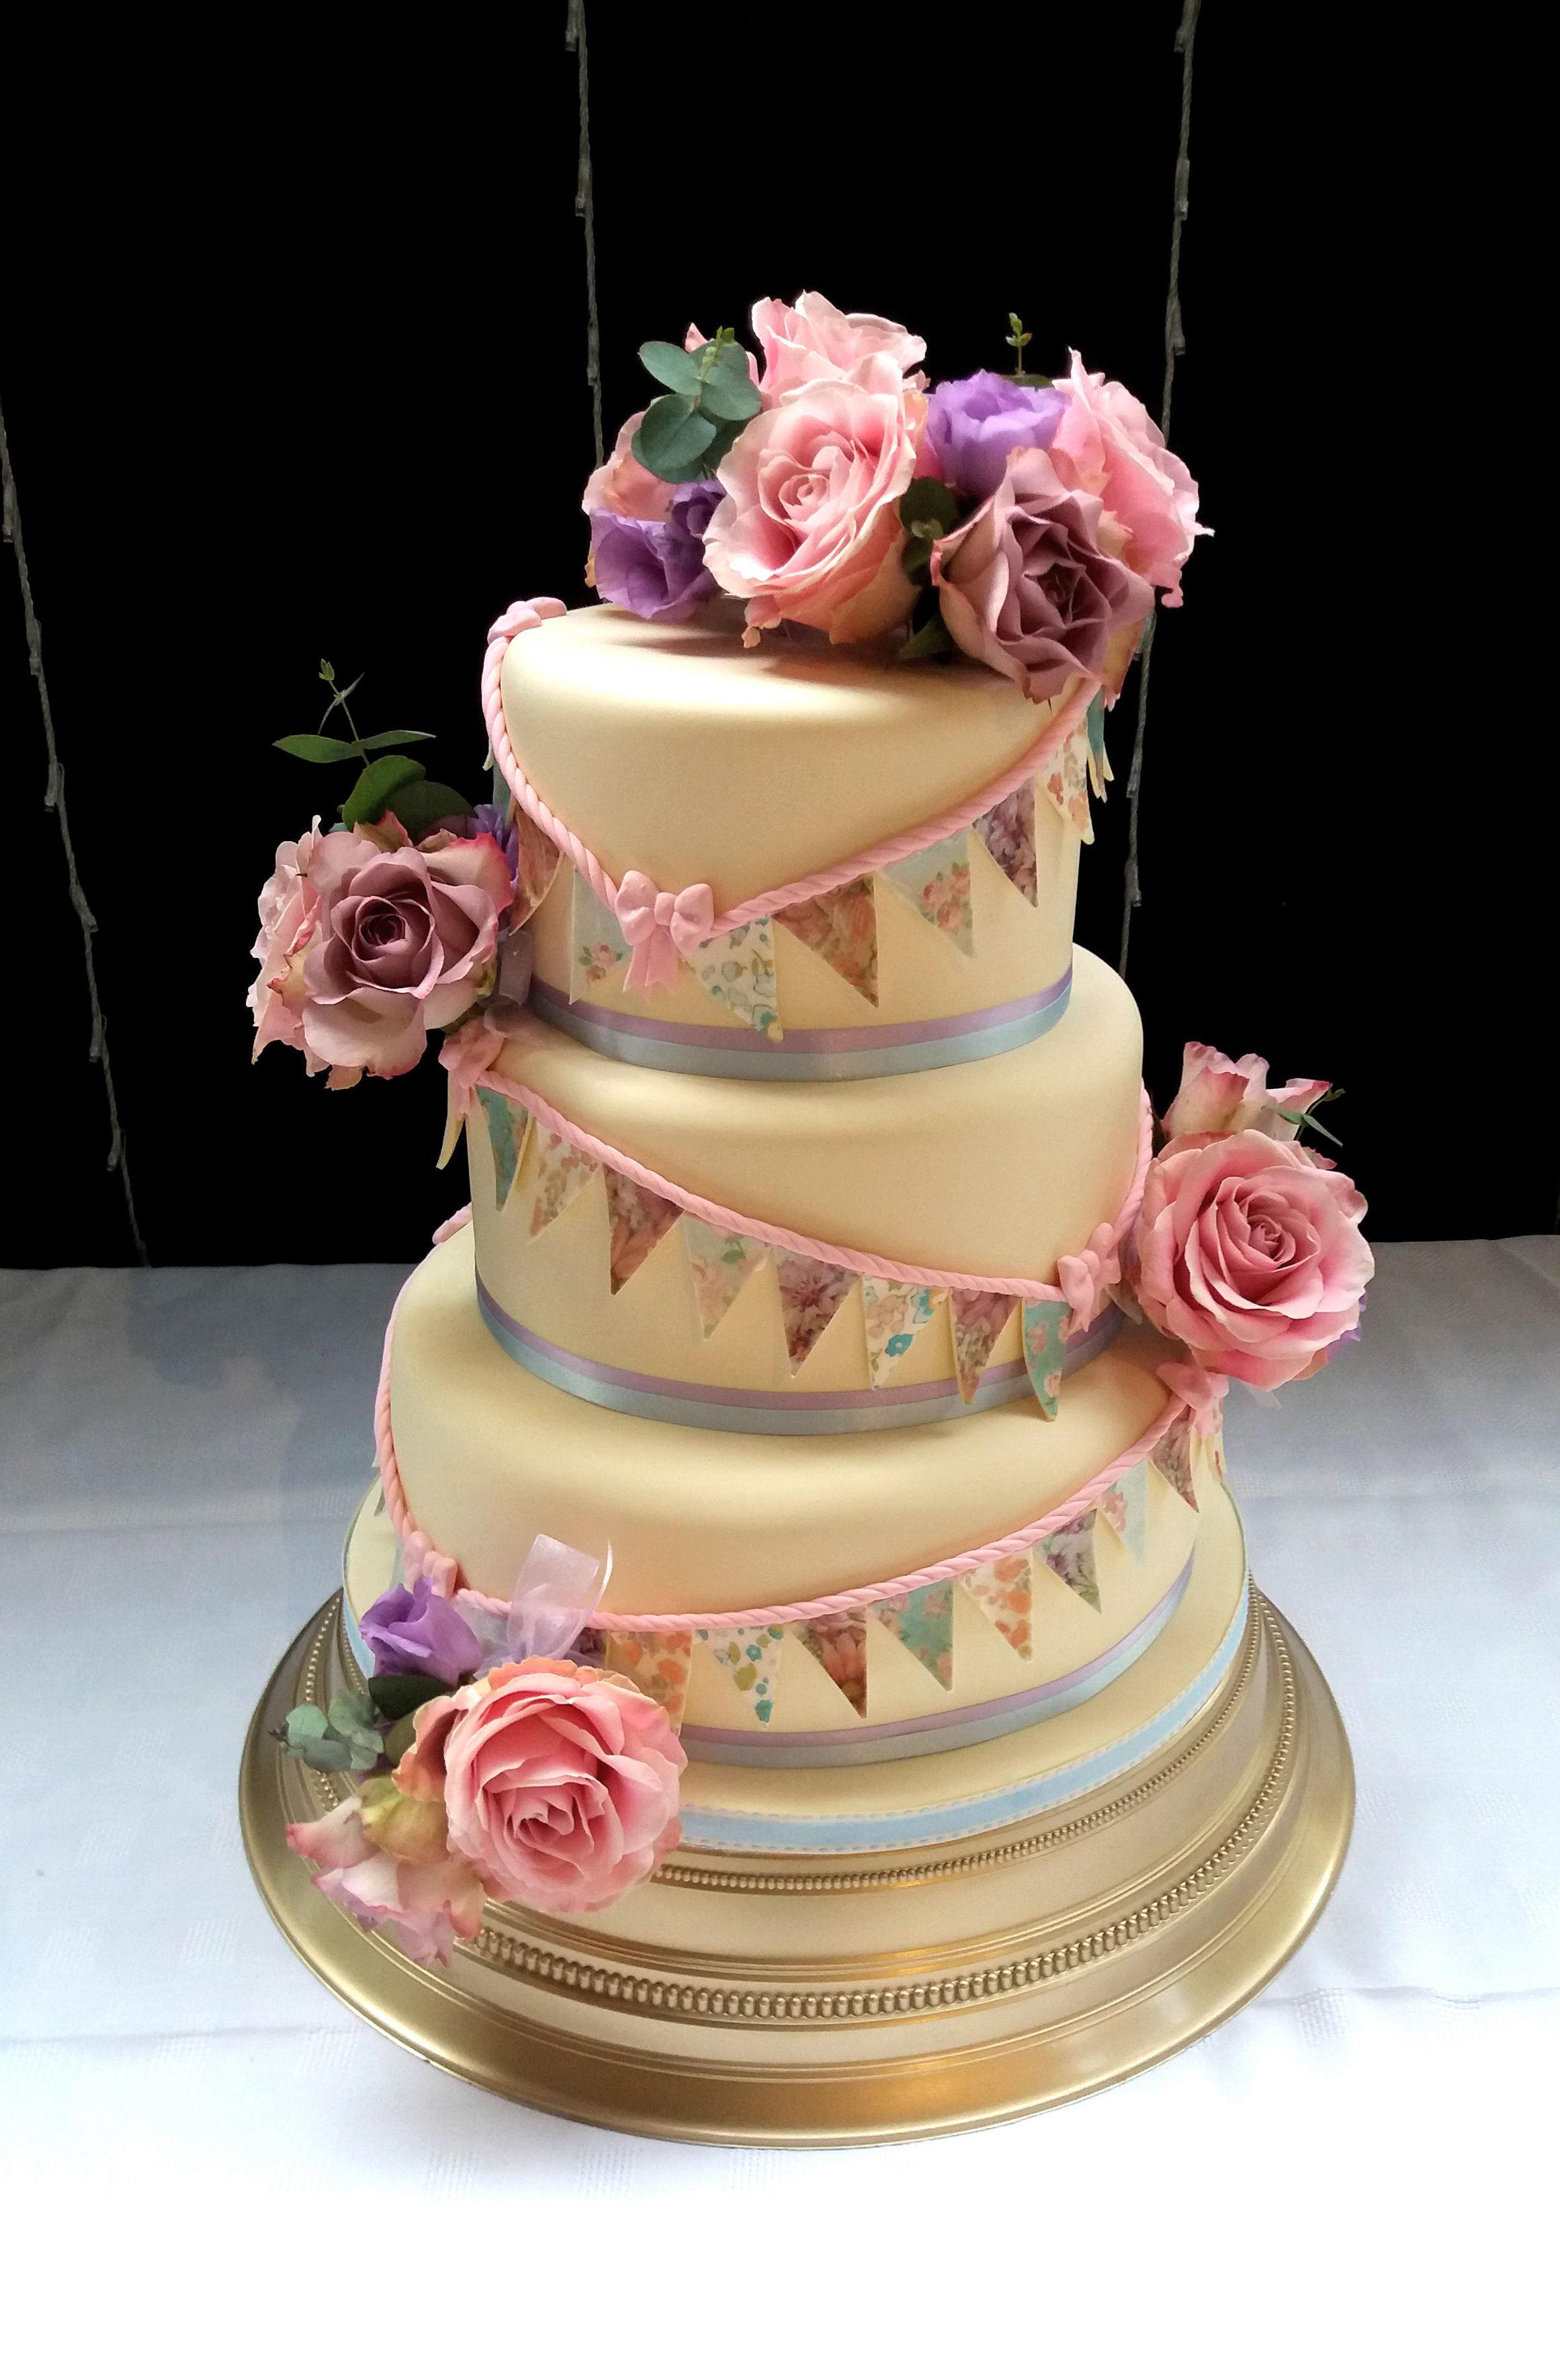 Vintage Bunting and fresh flower wedding cake